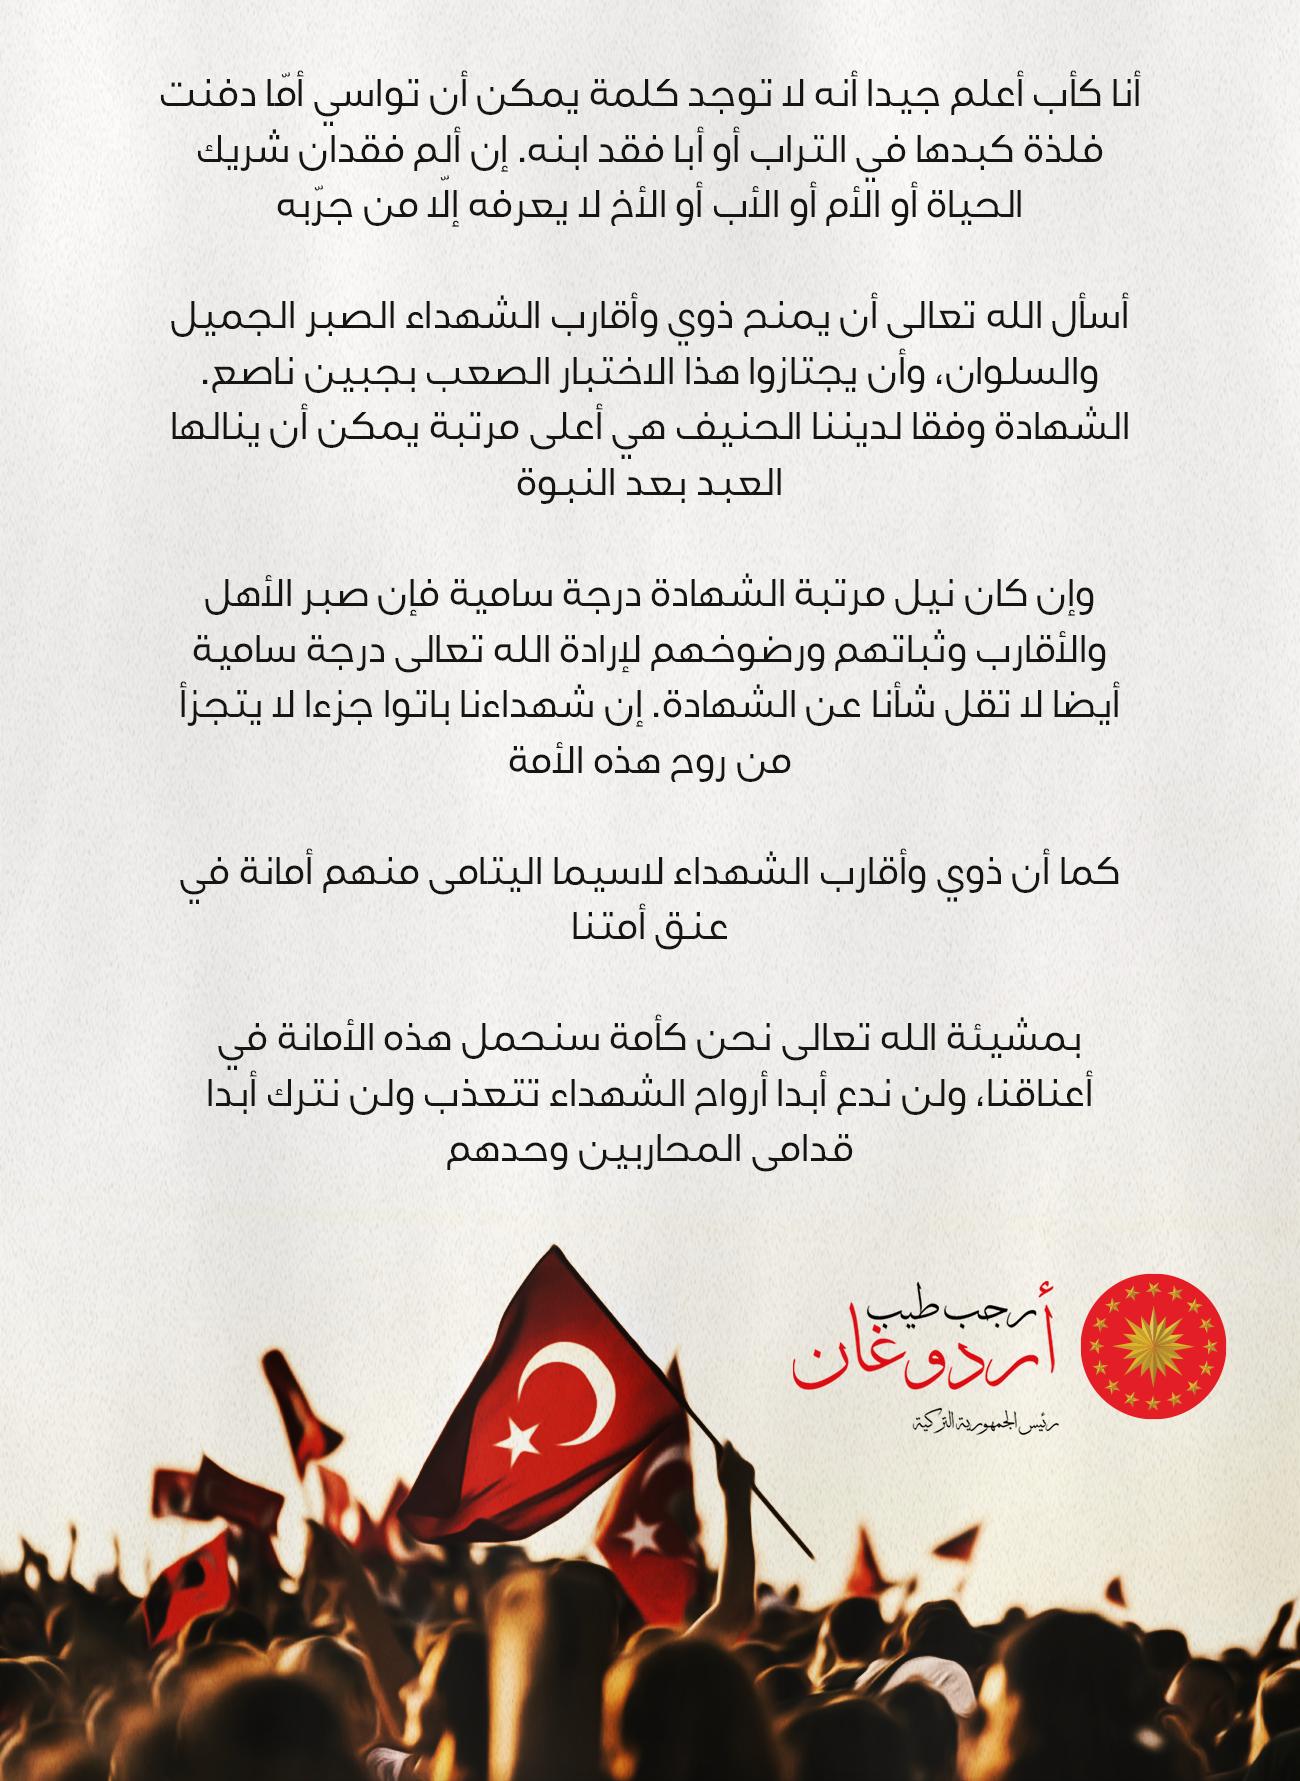 Ec kEYaXYAAq5tM - الرئيس التركي يغرد على حسابه الشخصي بمناسبة ذكرى 15 تموز